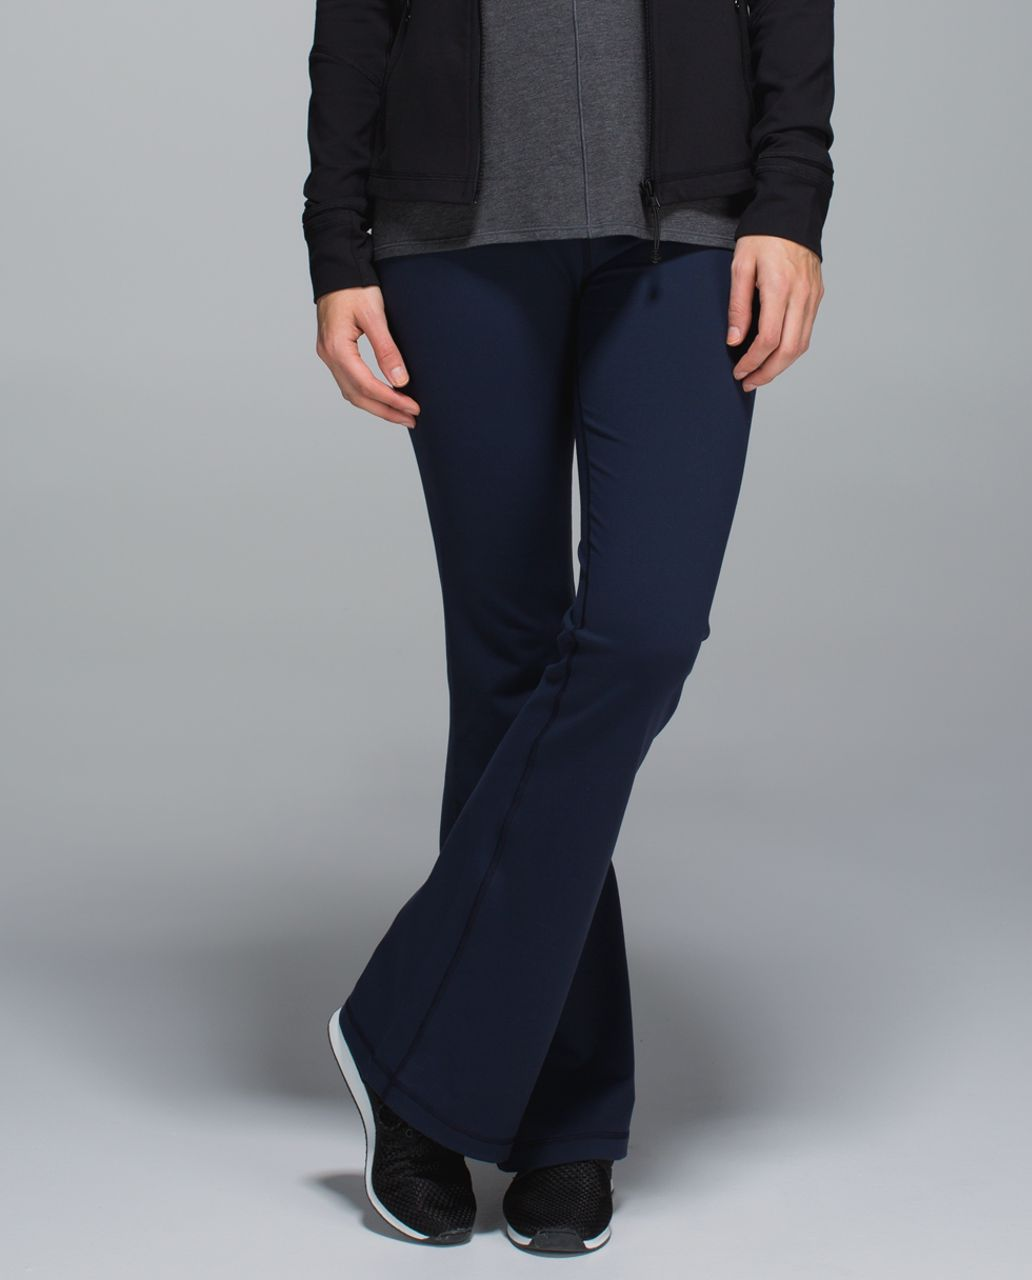 Lululemon Groove Pant *Full-On Luon (Regular) - Inkwell / Capilano Stripe Inkwell Black / Black